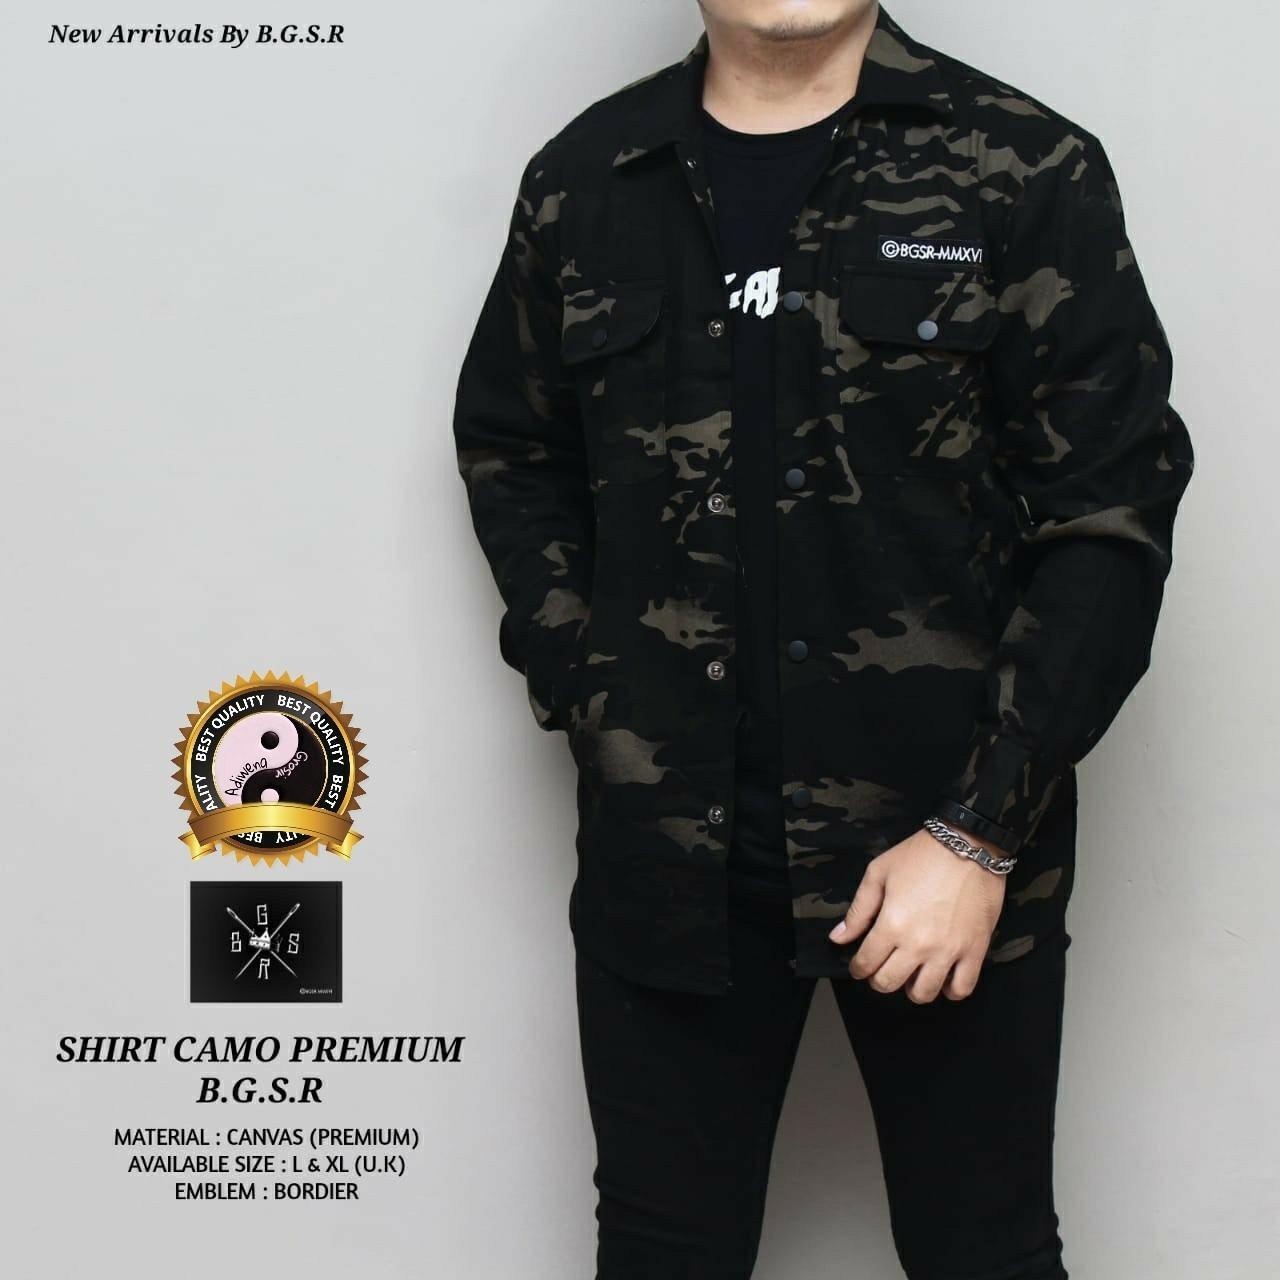 Adiwena Grosir Jaket camo premium bordir suede bgsr simple pria best seller - hitam - black